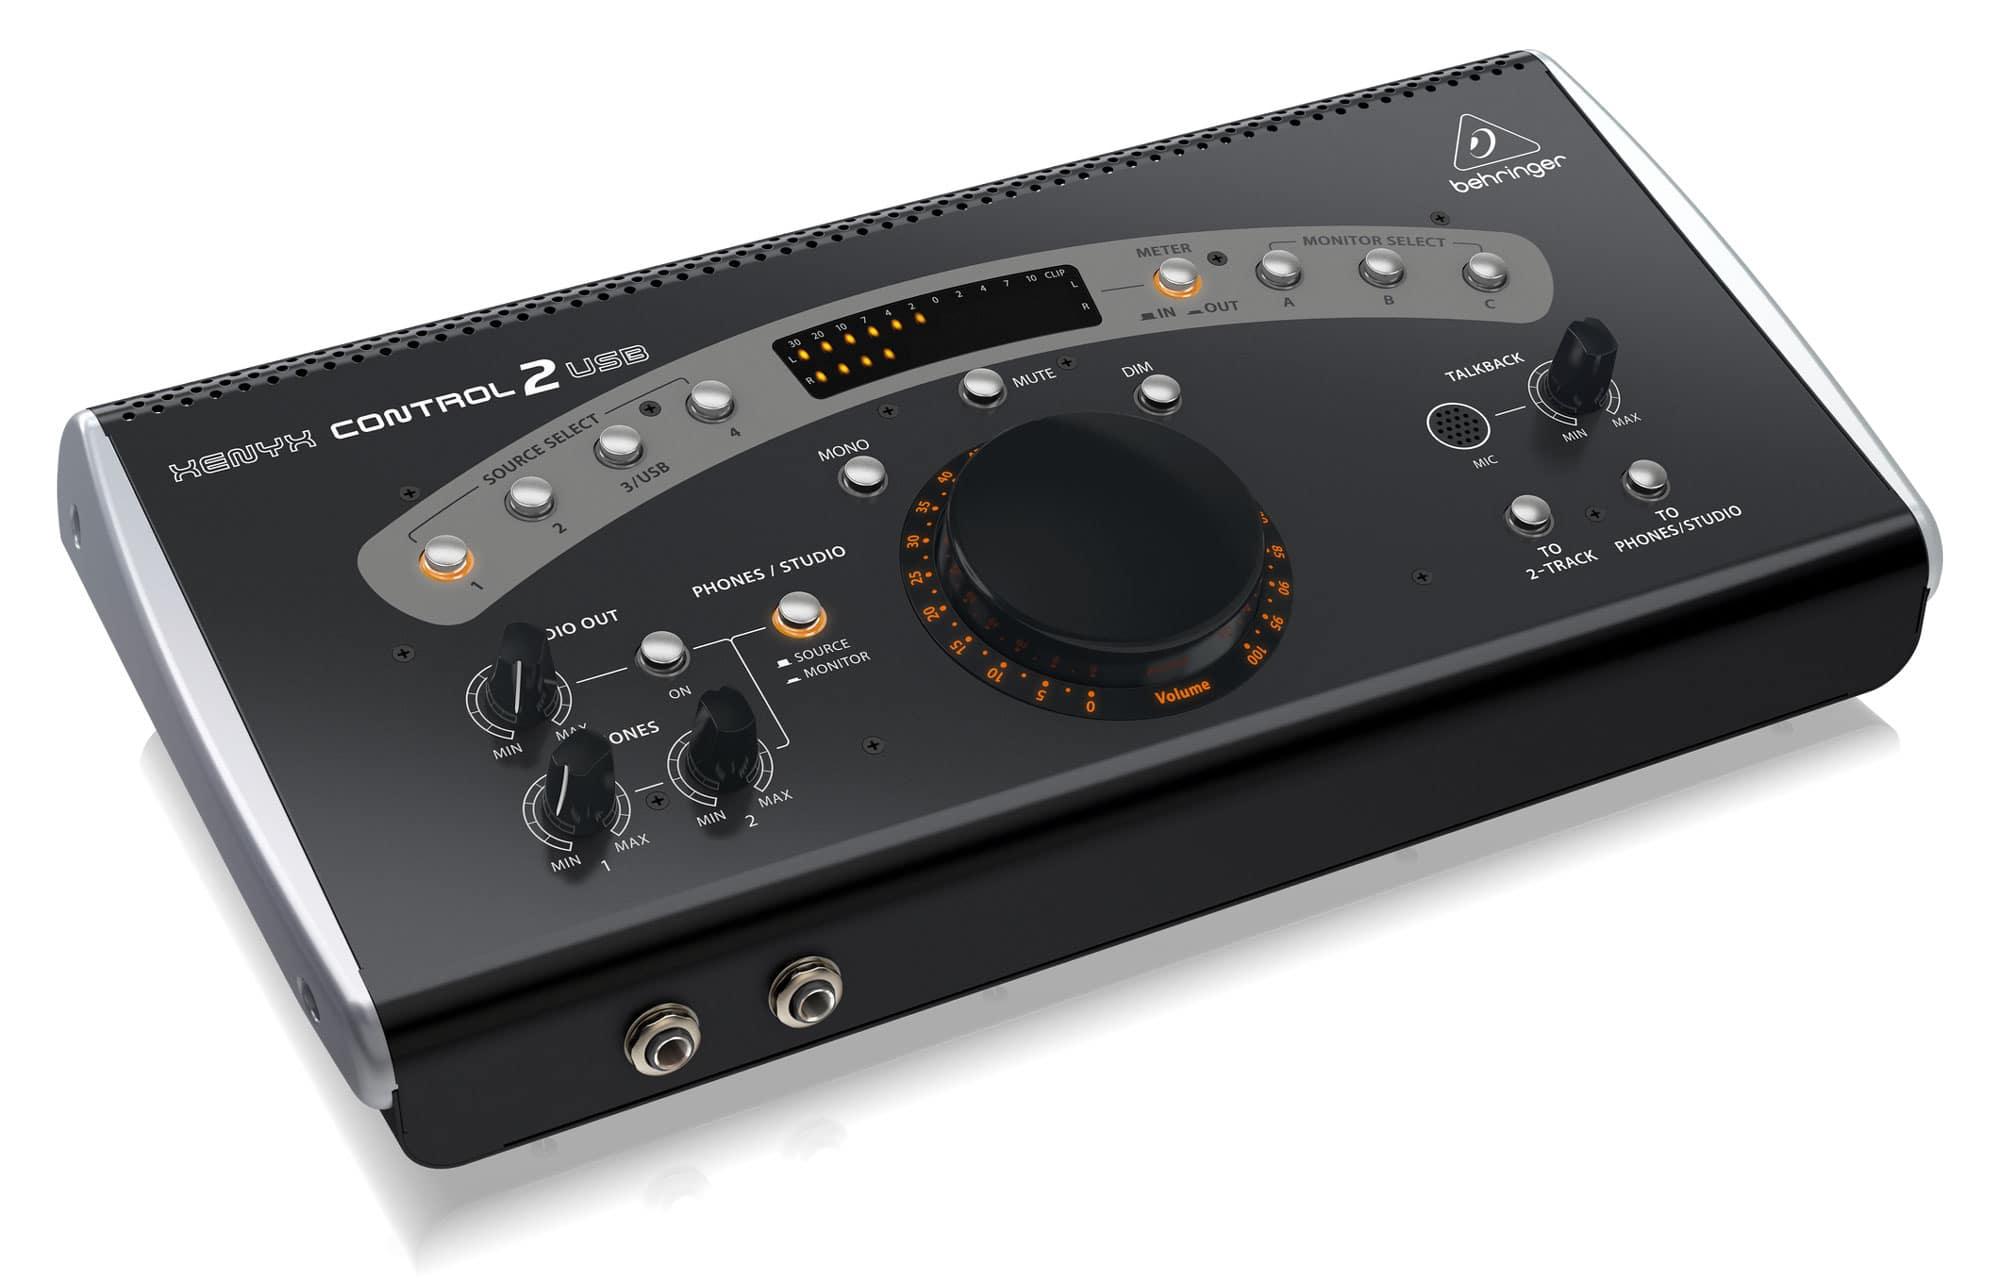 Studiomonitore - Behringer Control2USB Studio Monitor Controller - Onlineshop Musikhaus Kirstein